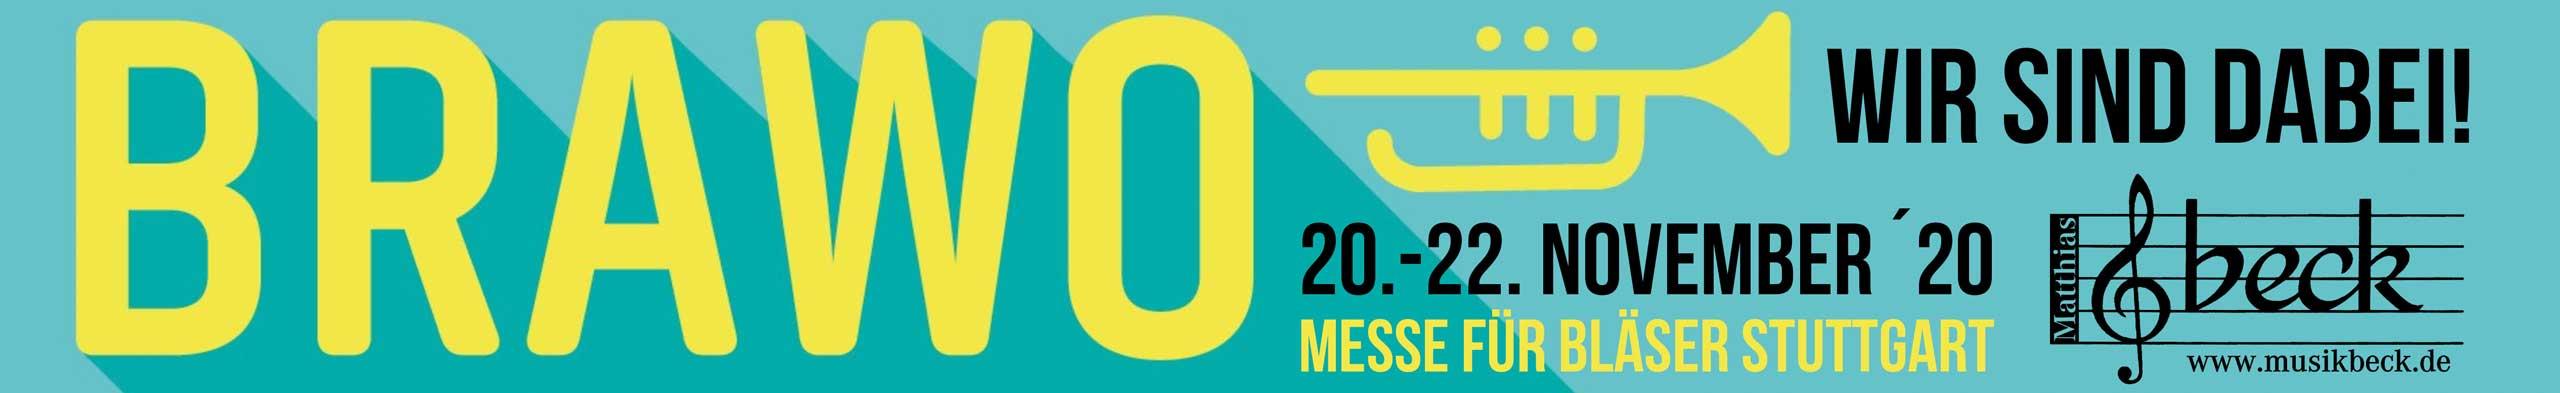 BRAWO Blasorchester-Messe Musikmesse Stuttgart mit dem Musikhaus Beck